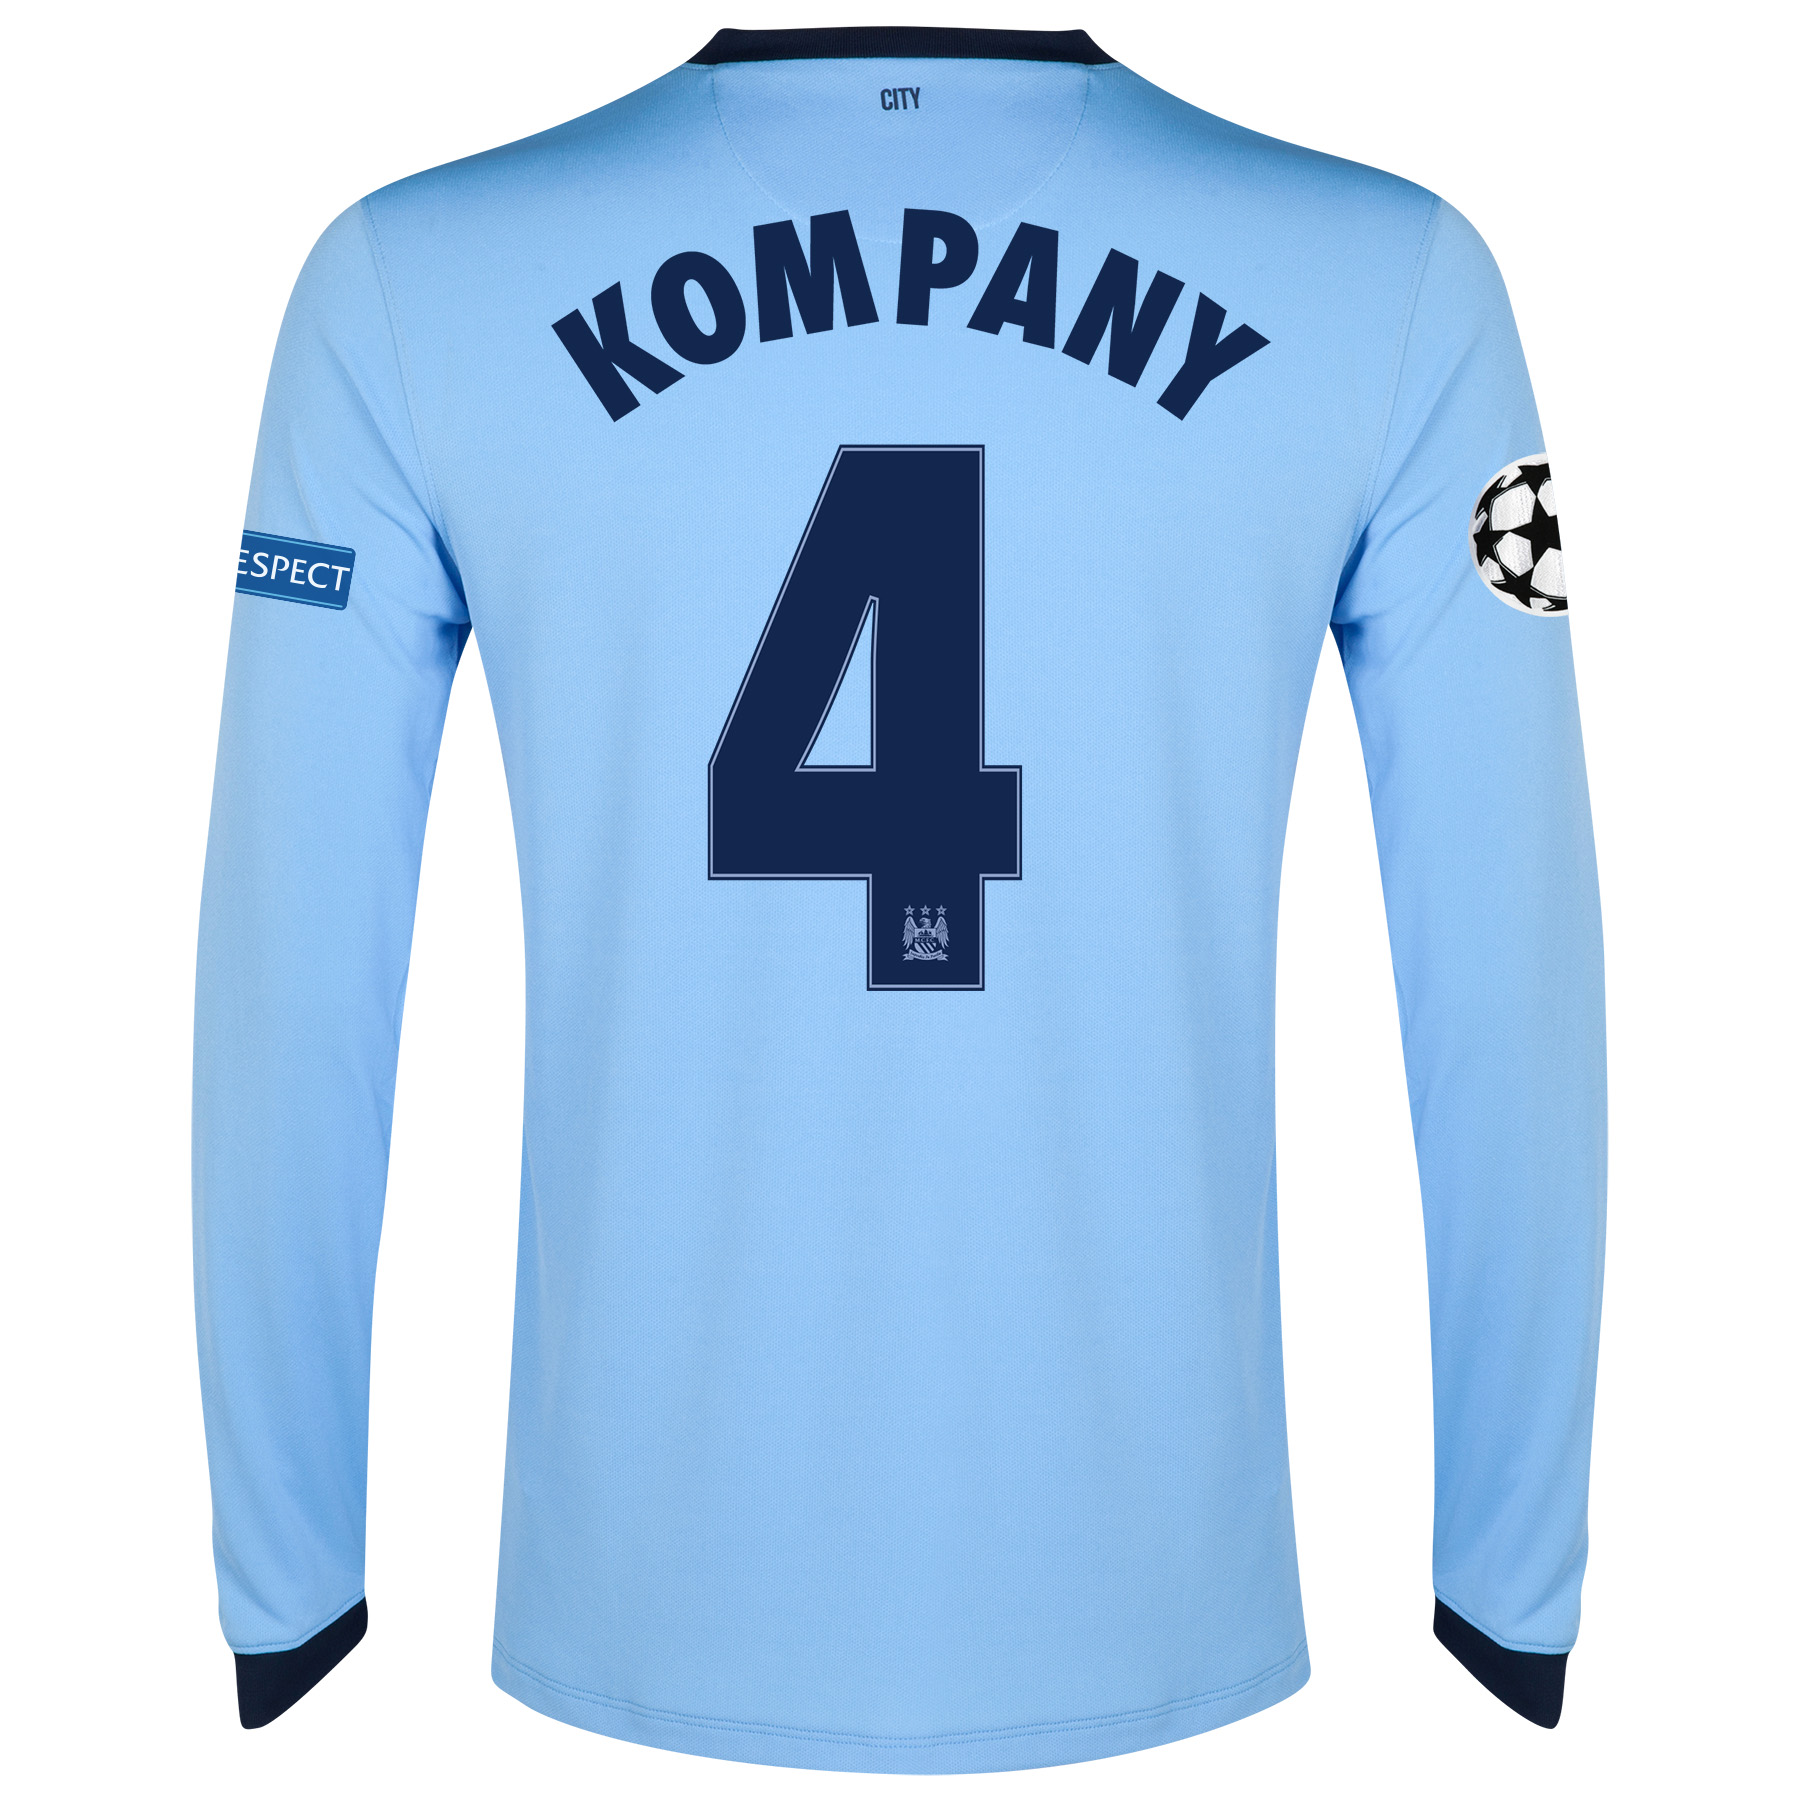 Manchester City UEFA Champions League Home Shirt 2014/15 - Long Sleeve - Kids Sky Blue with Kompany 4 printing